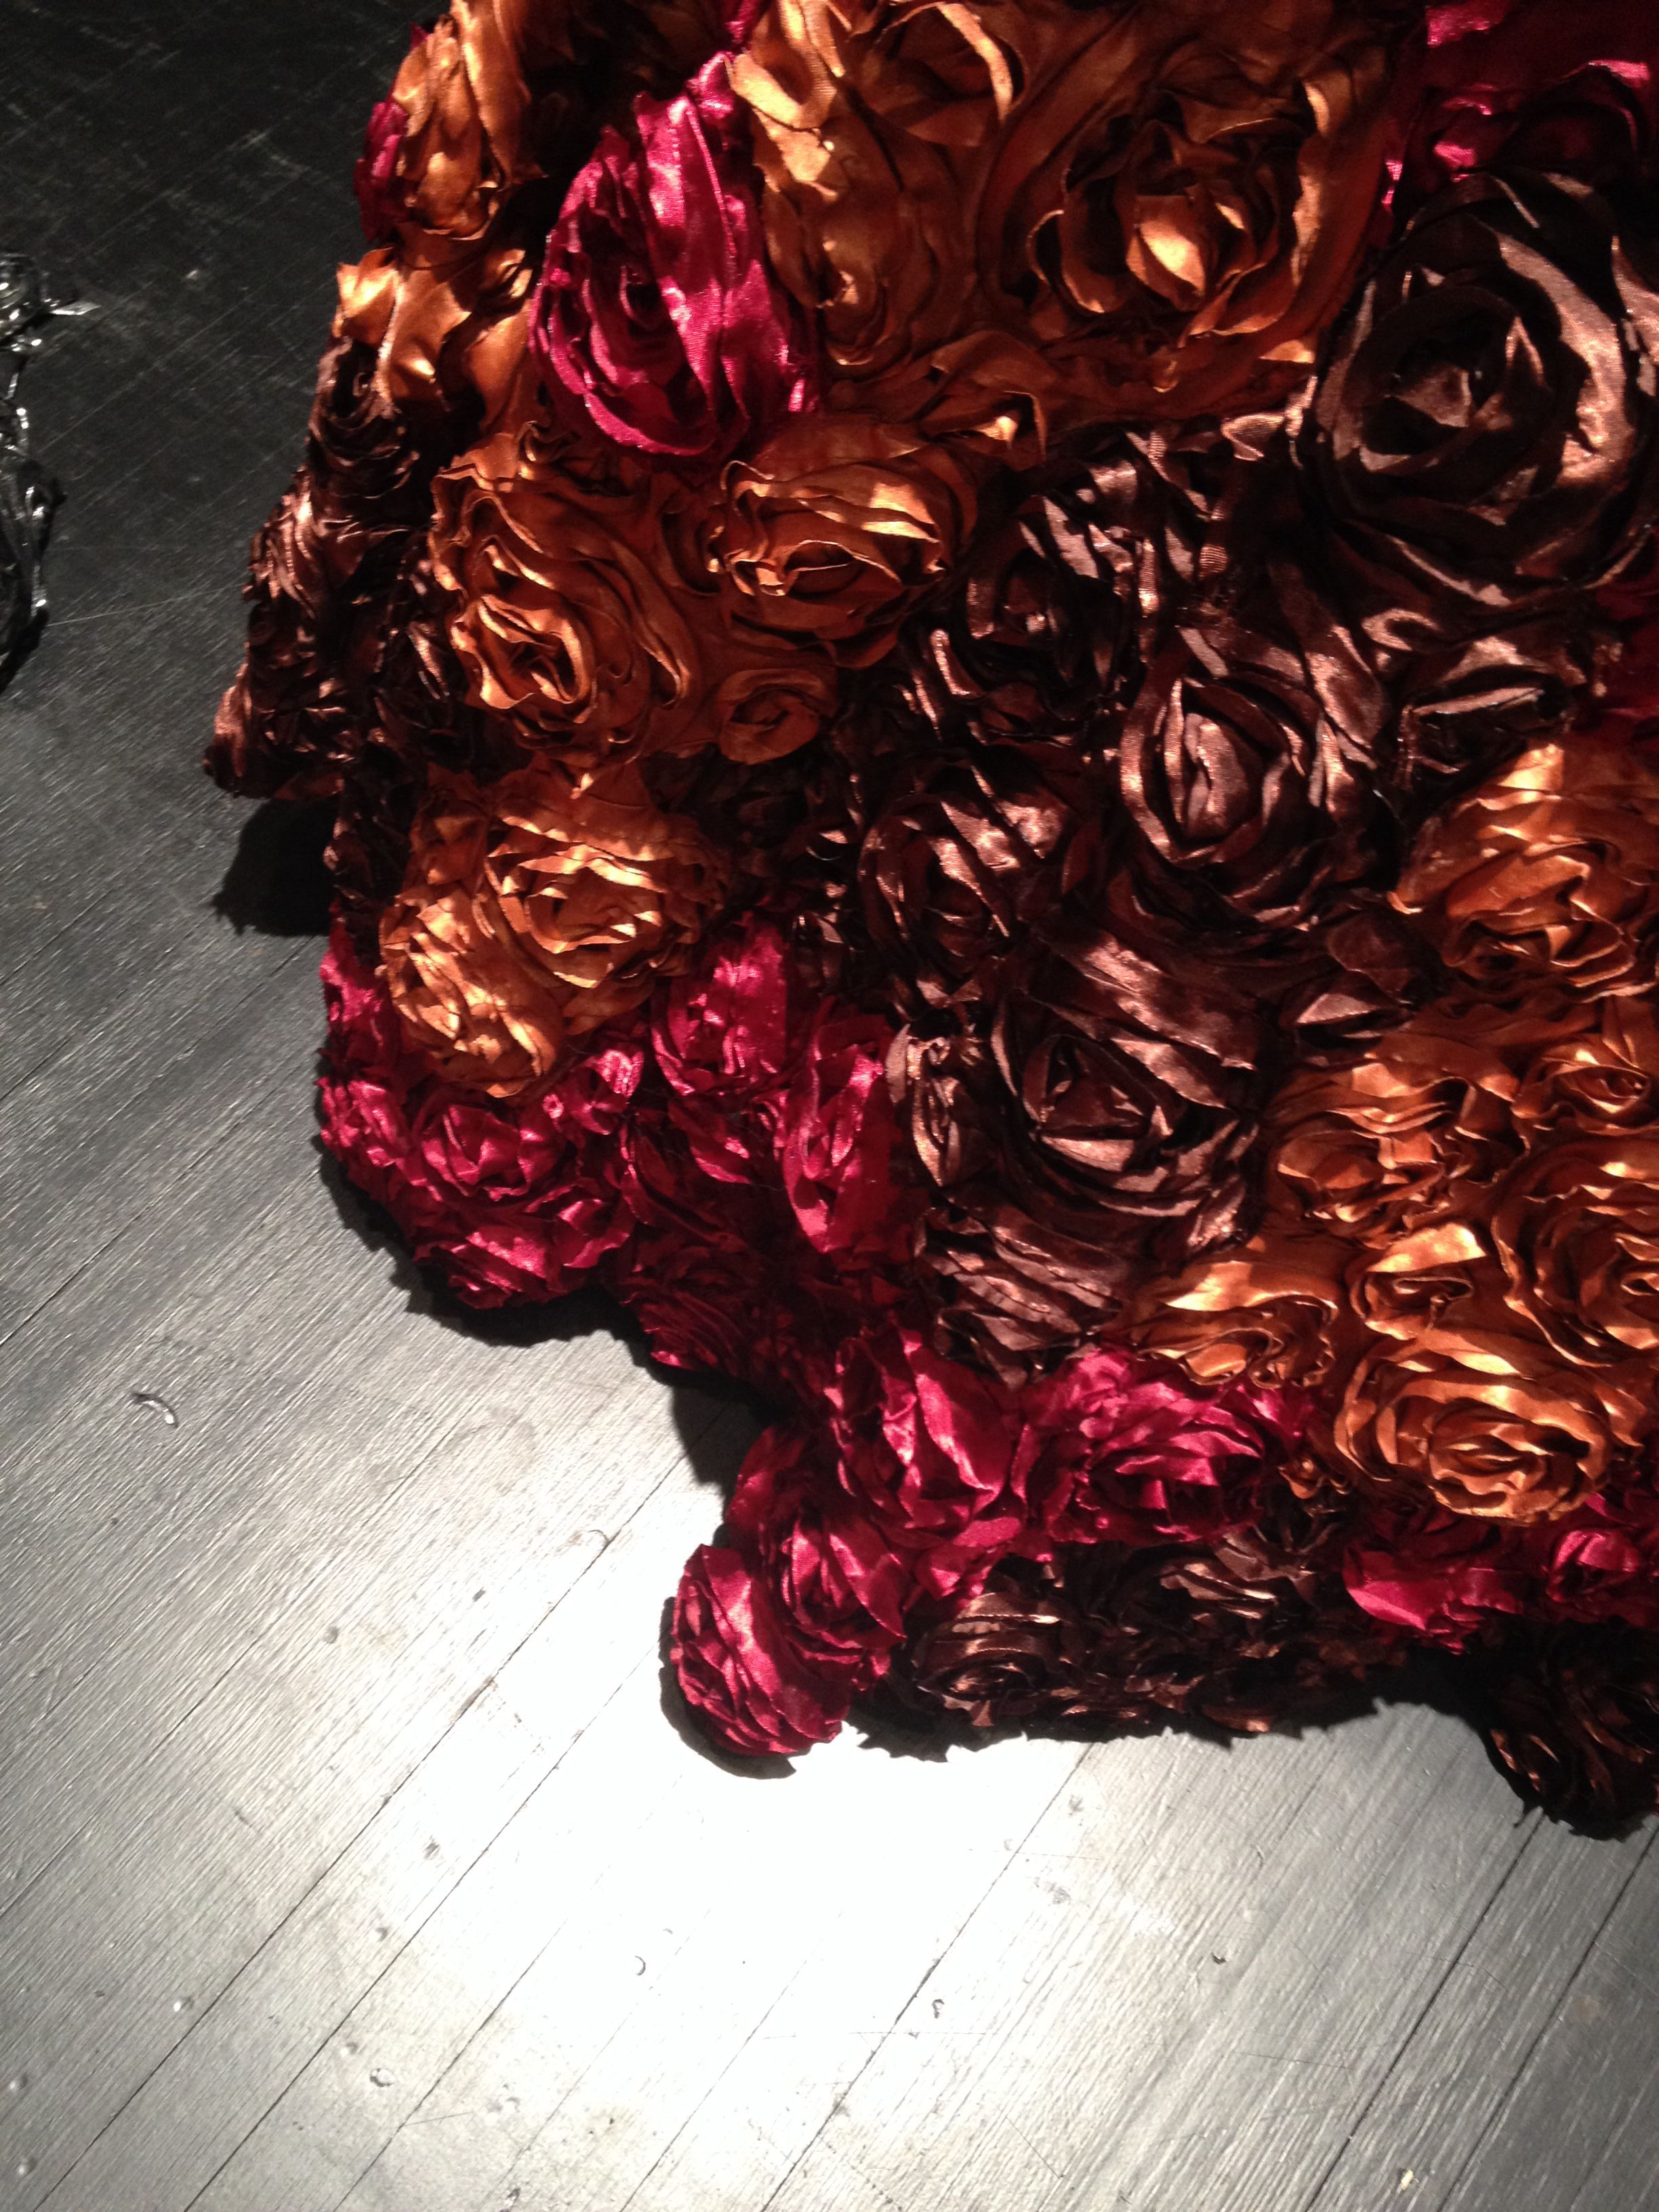 "Zaza.s klänning i musikalen ""La Cage aux Folles"". Kostymdesigner Ina Andersson.  #lacageauxfolles #lacage #musikal #norrbottensteatern #rosor #roses #brons #rött #brunt #design #red #brown #bronze #dress"